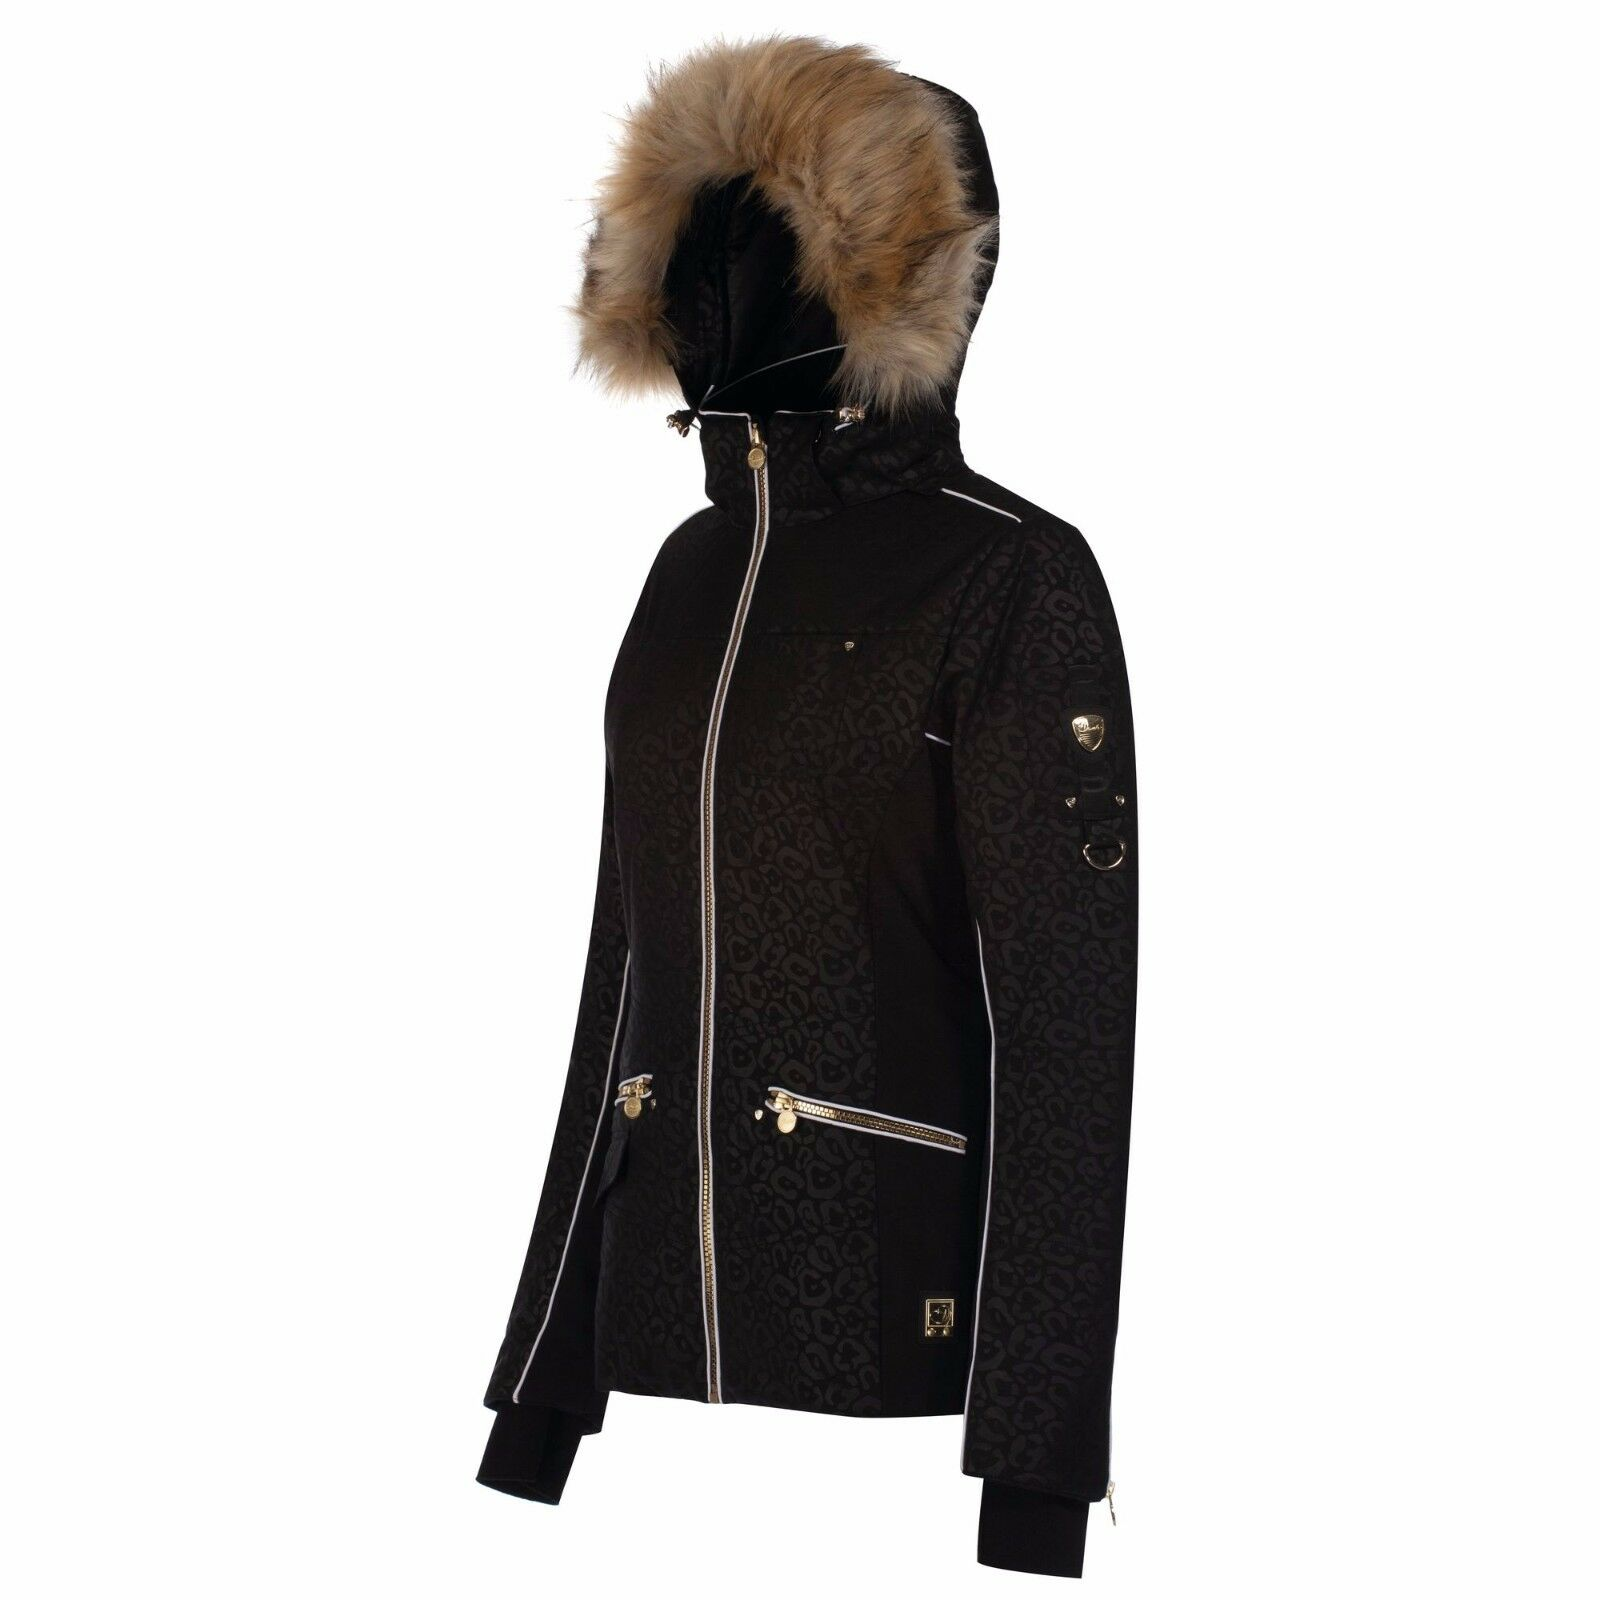 Dare 2b Incentivise 14 Luxury Ski Jacket Waterproof Beathable Black ... 6b50259b2